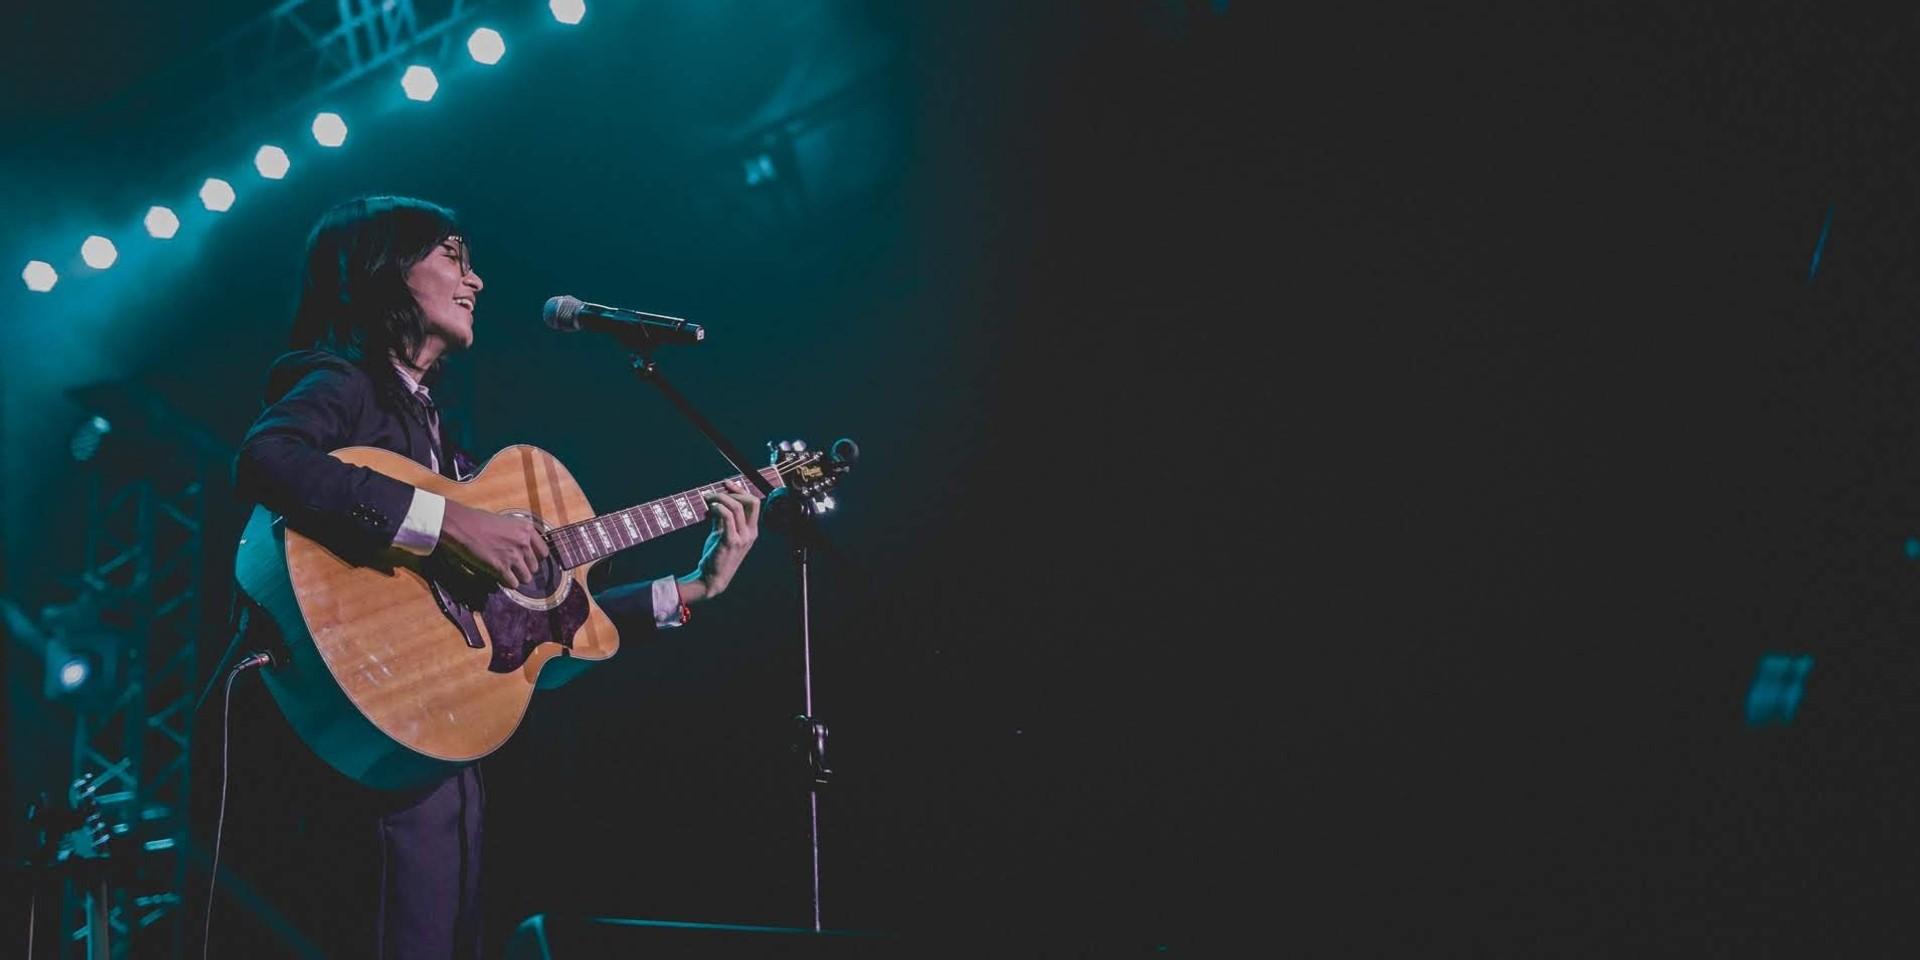 Unique reveals a happier self in solo concert – gig report